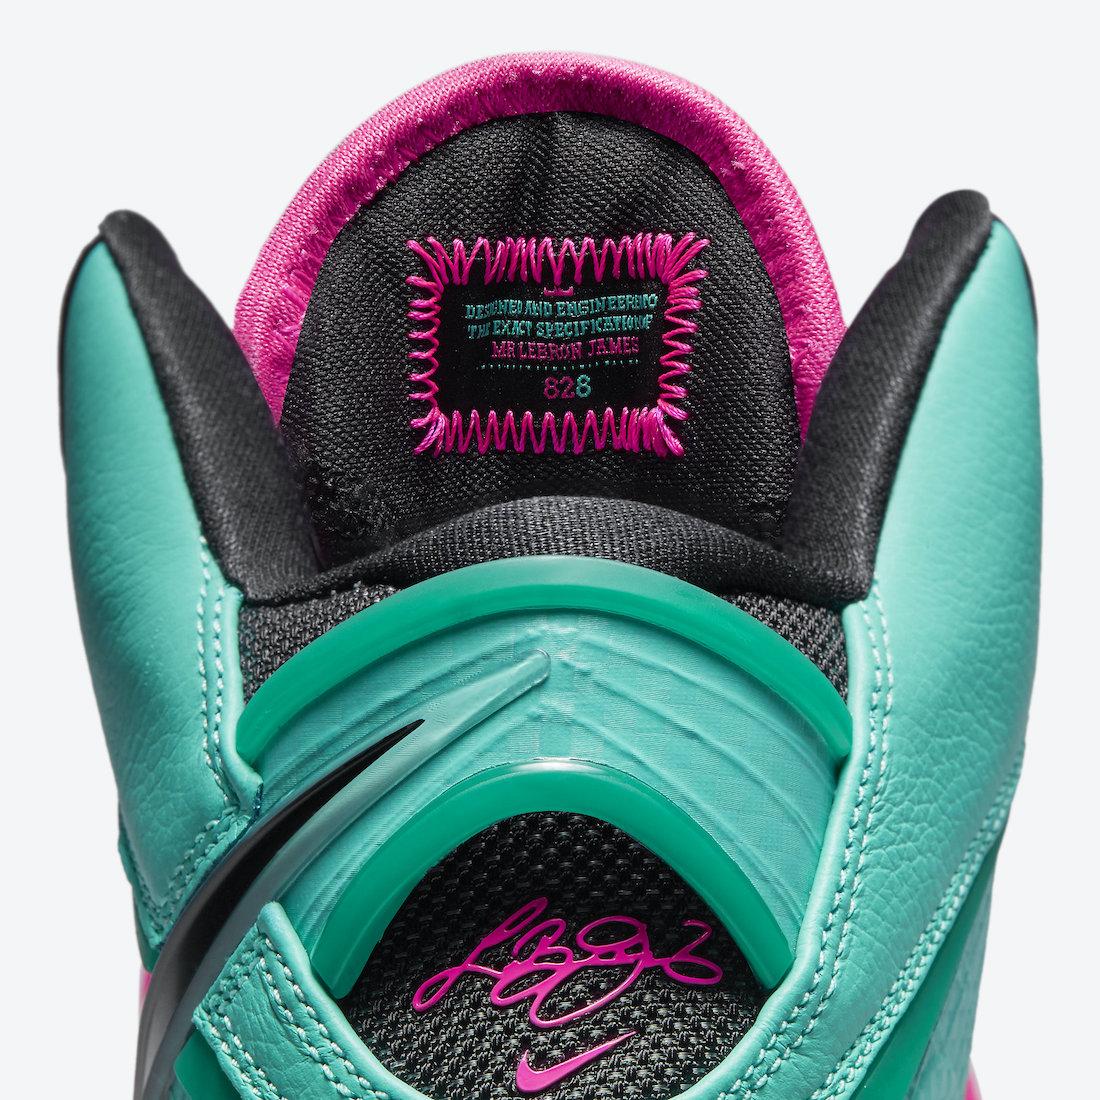 Nike-LeBron-8-South-Beach-CZ0328-400-Release-Date-Price-9